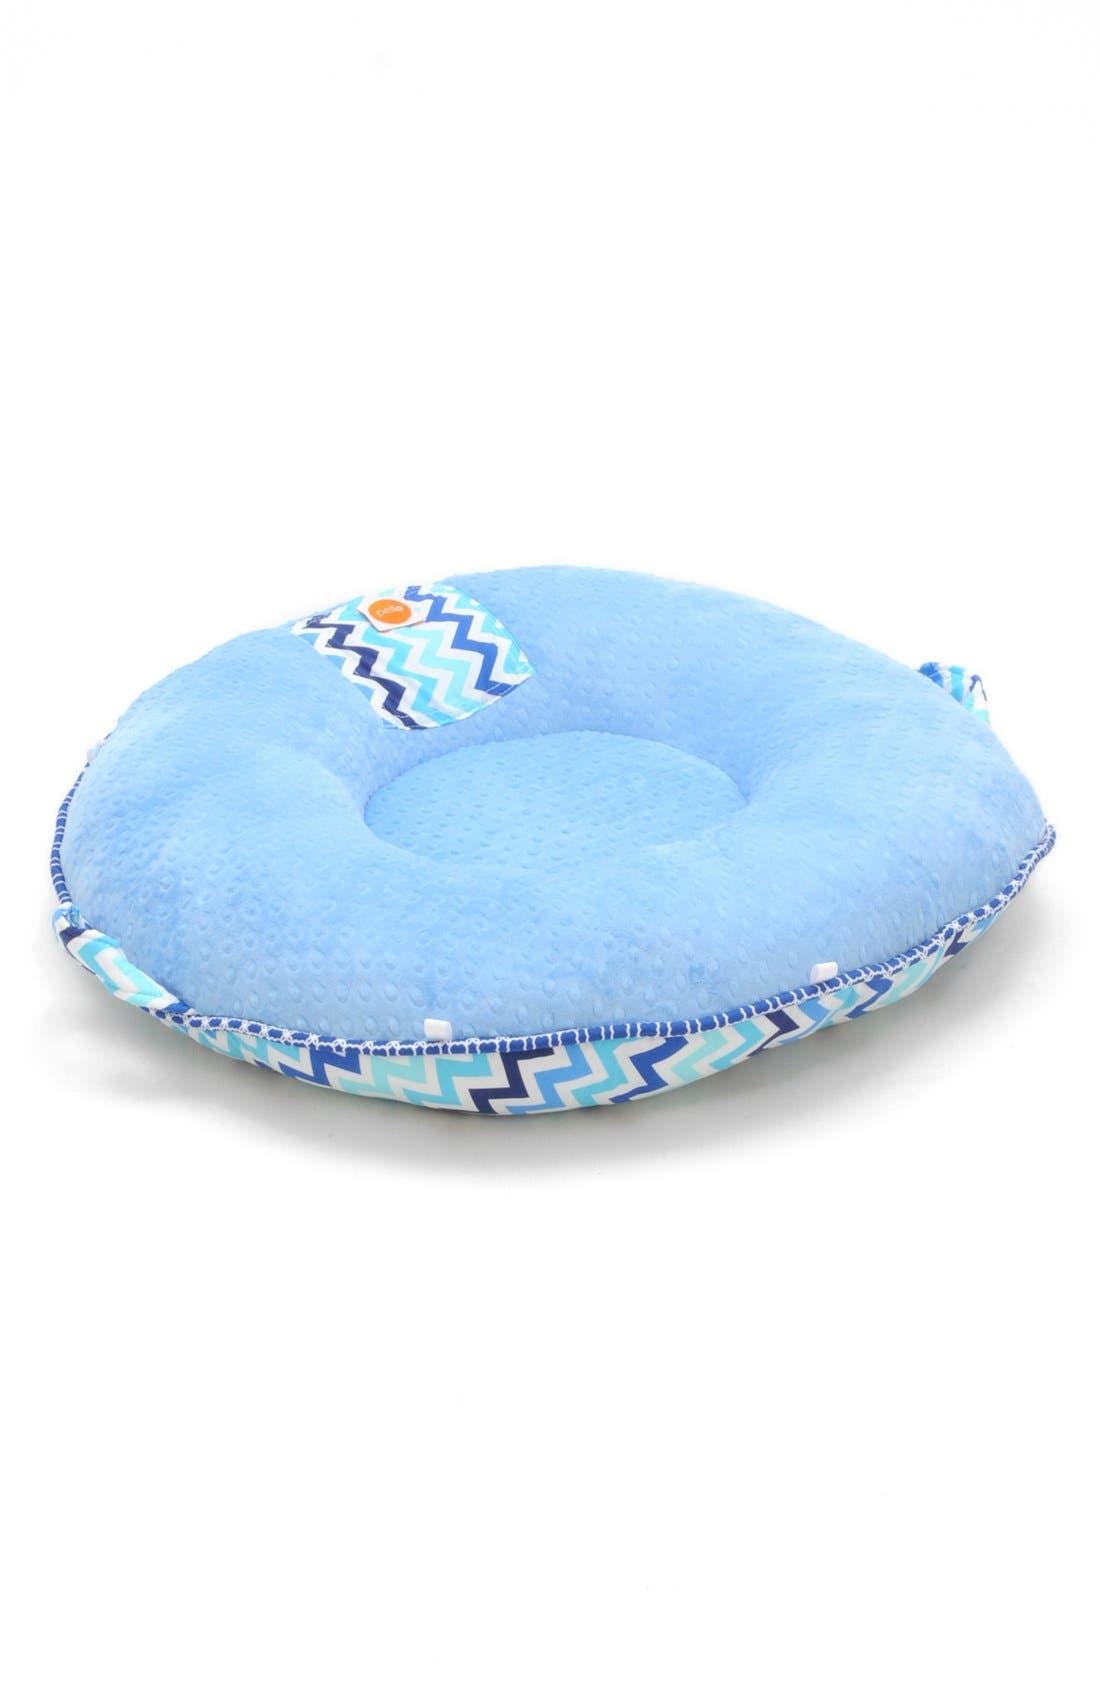 Alternate Image 3  - Pello 'Pello - High Tide' Portable Floor Pillow (Baby)